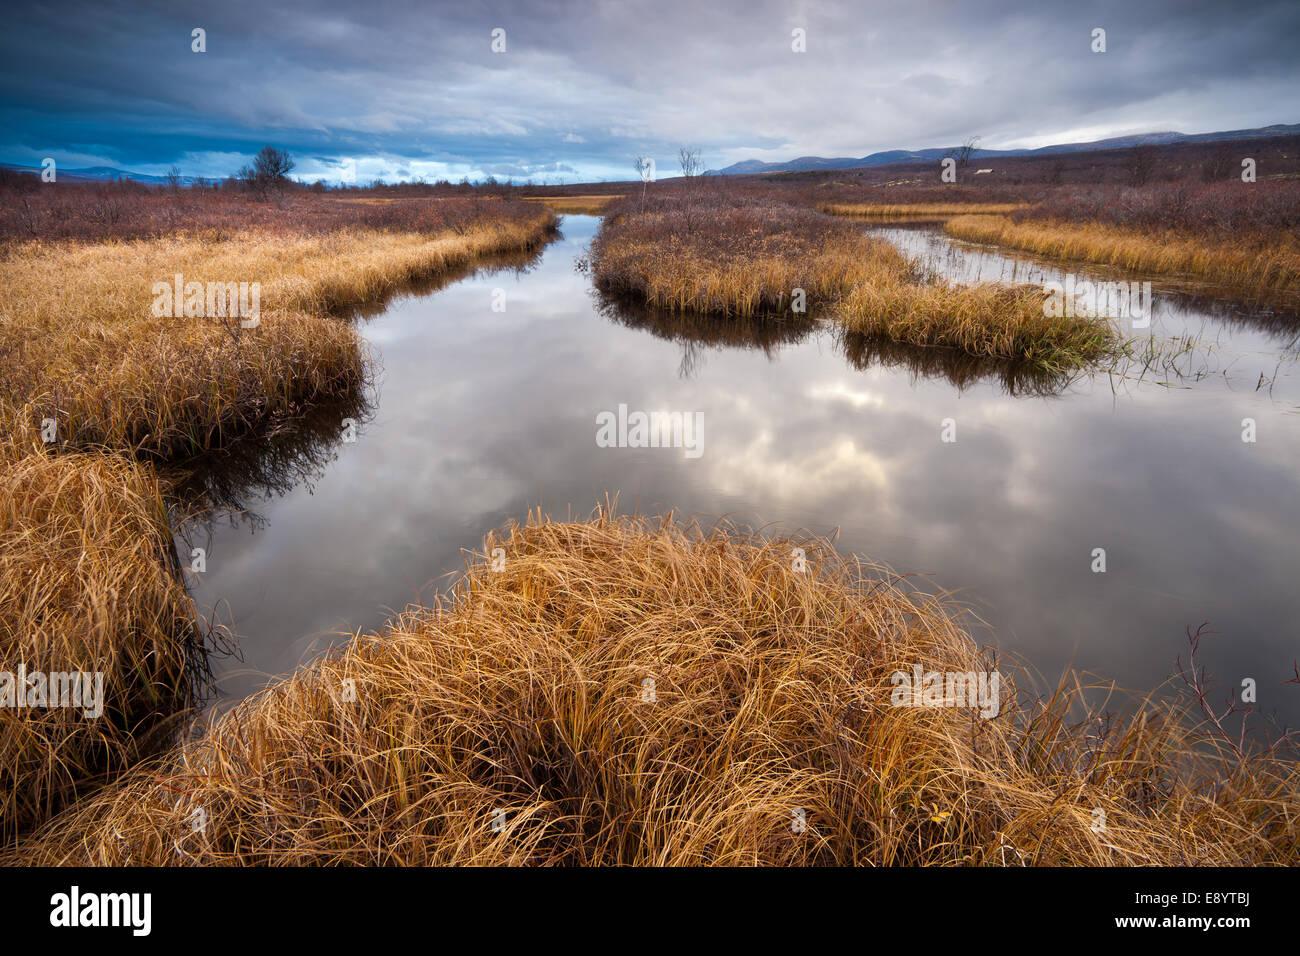 El otoño en la reserva natural de Fokstumyra Dovre kommune fylke, Oppland, Noruega. Imagen De Stock